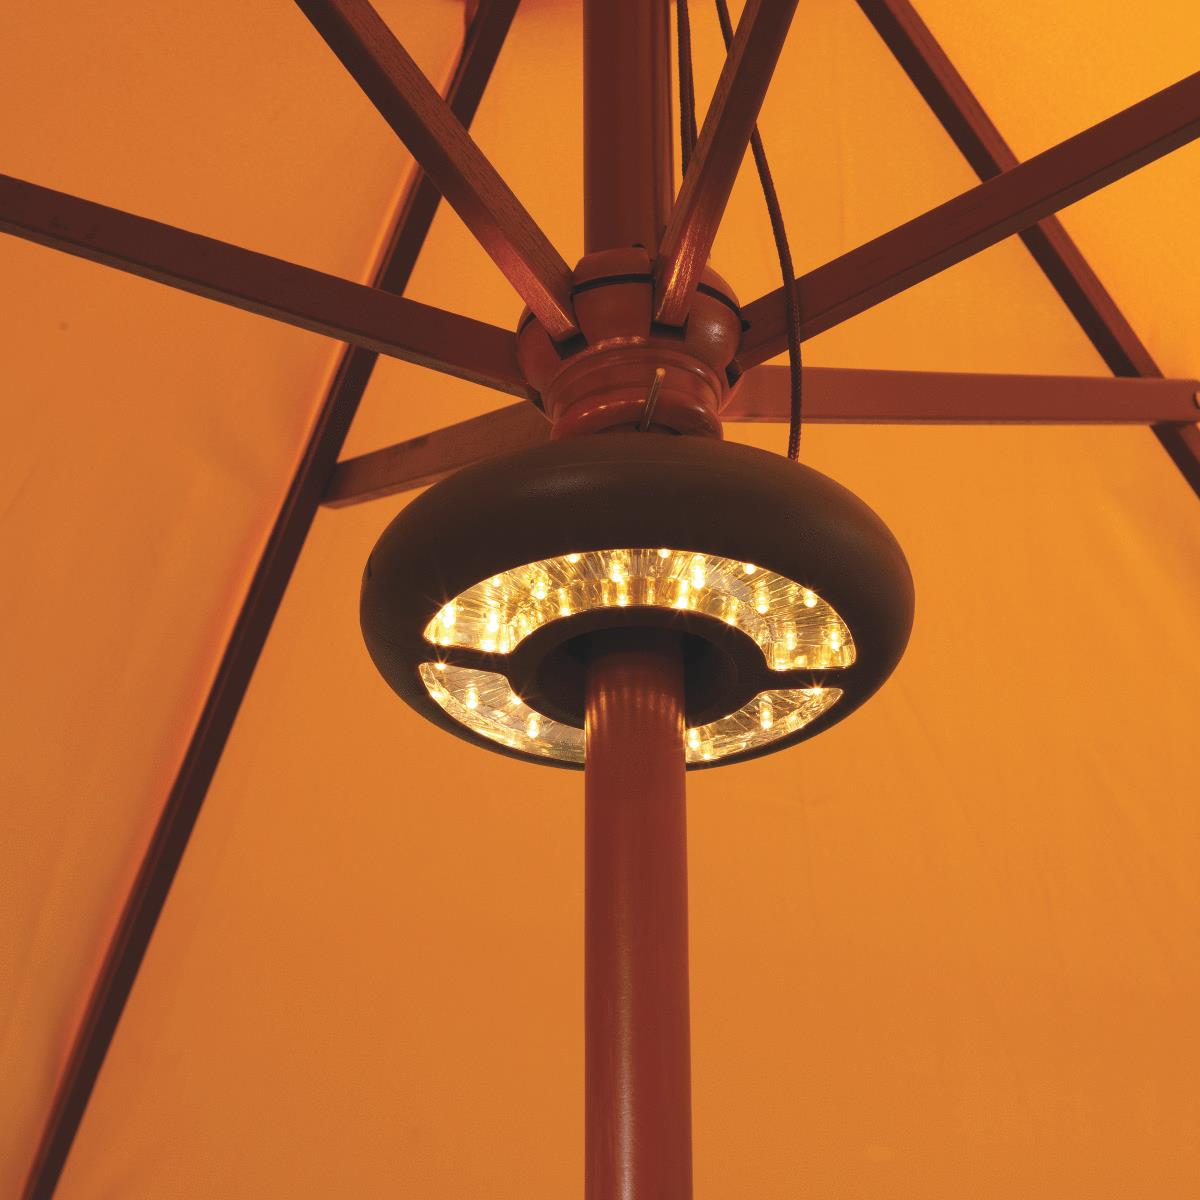 Everlasting Glow Battery LED Patio Umbrella Light